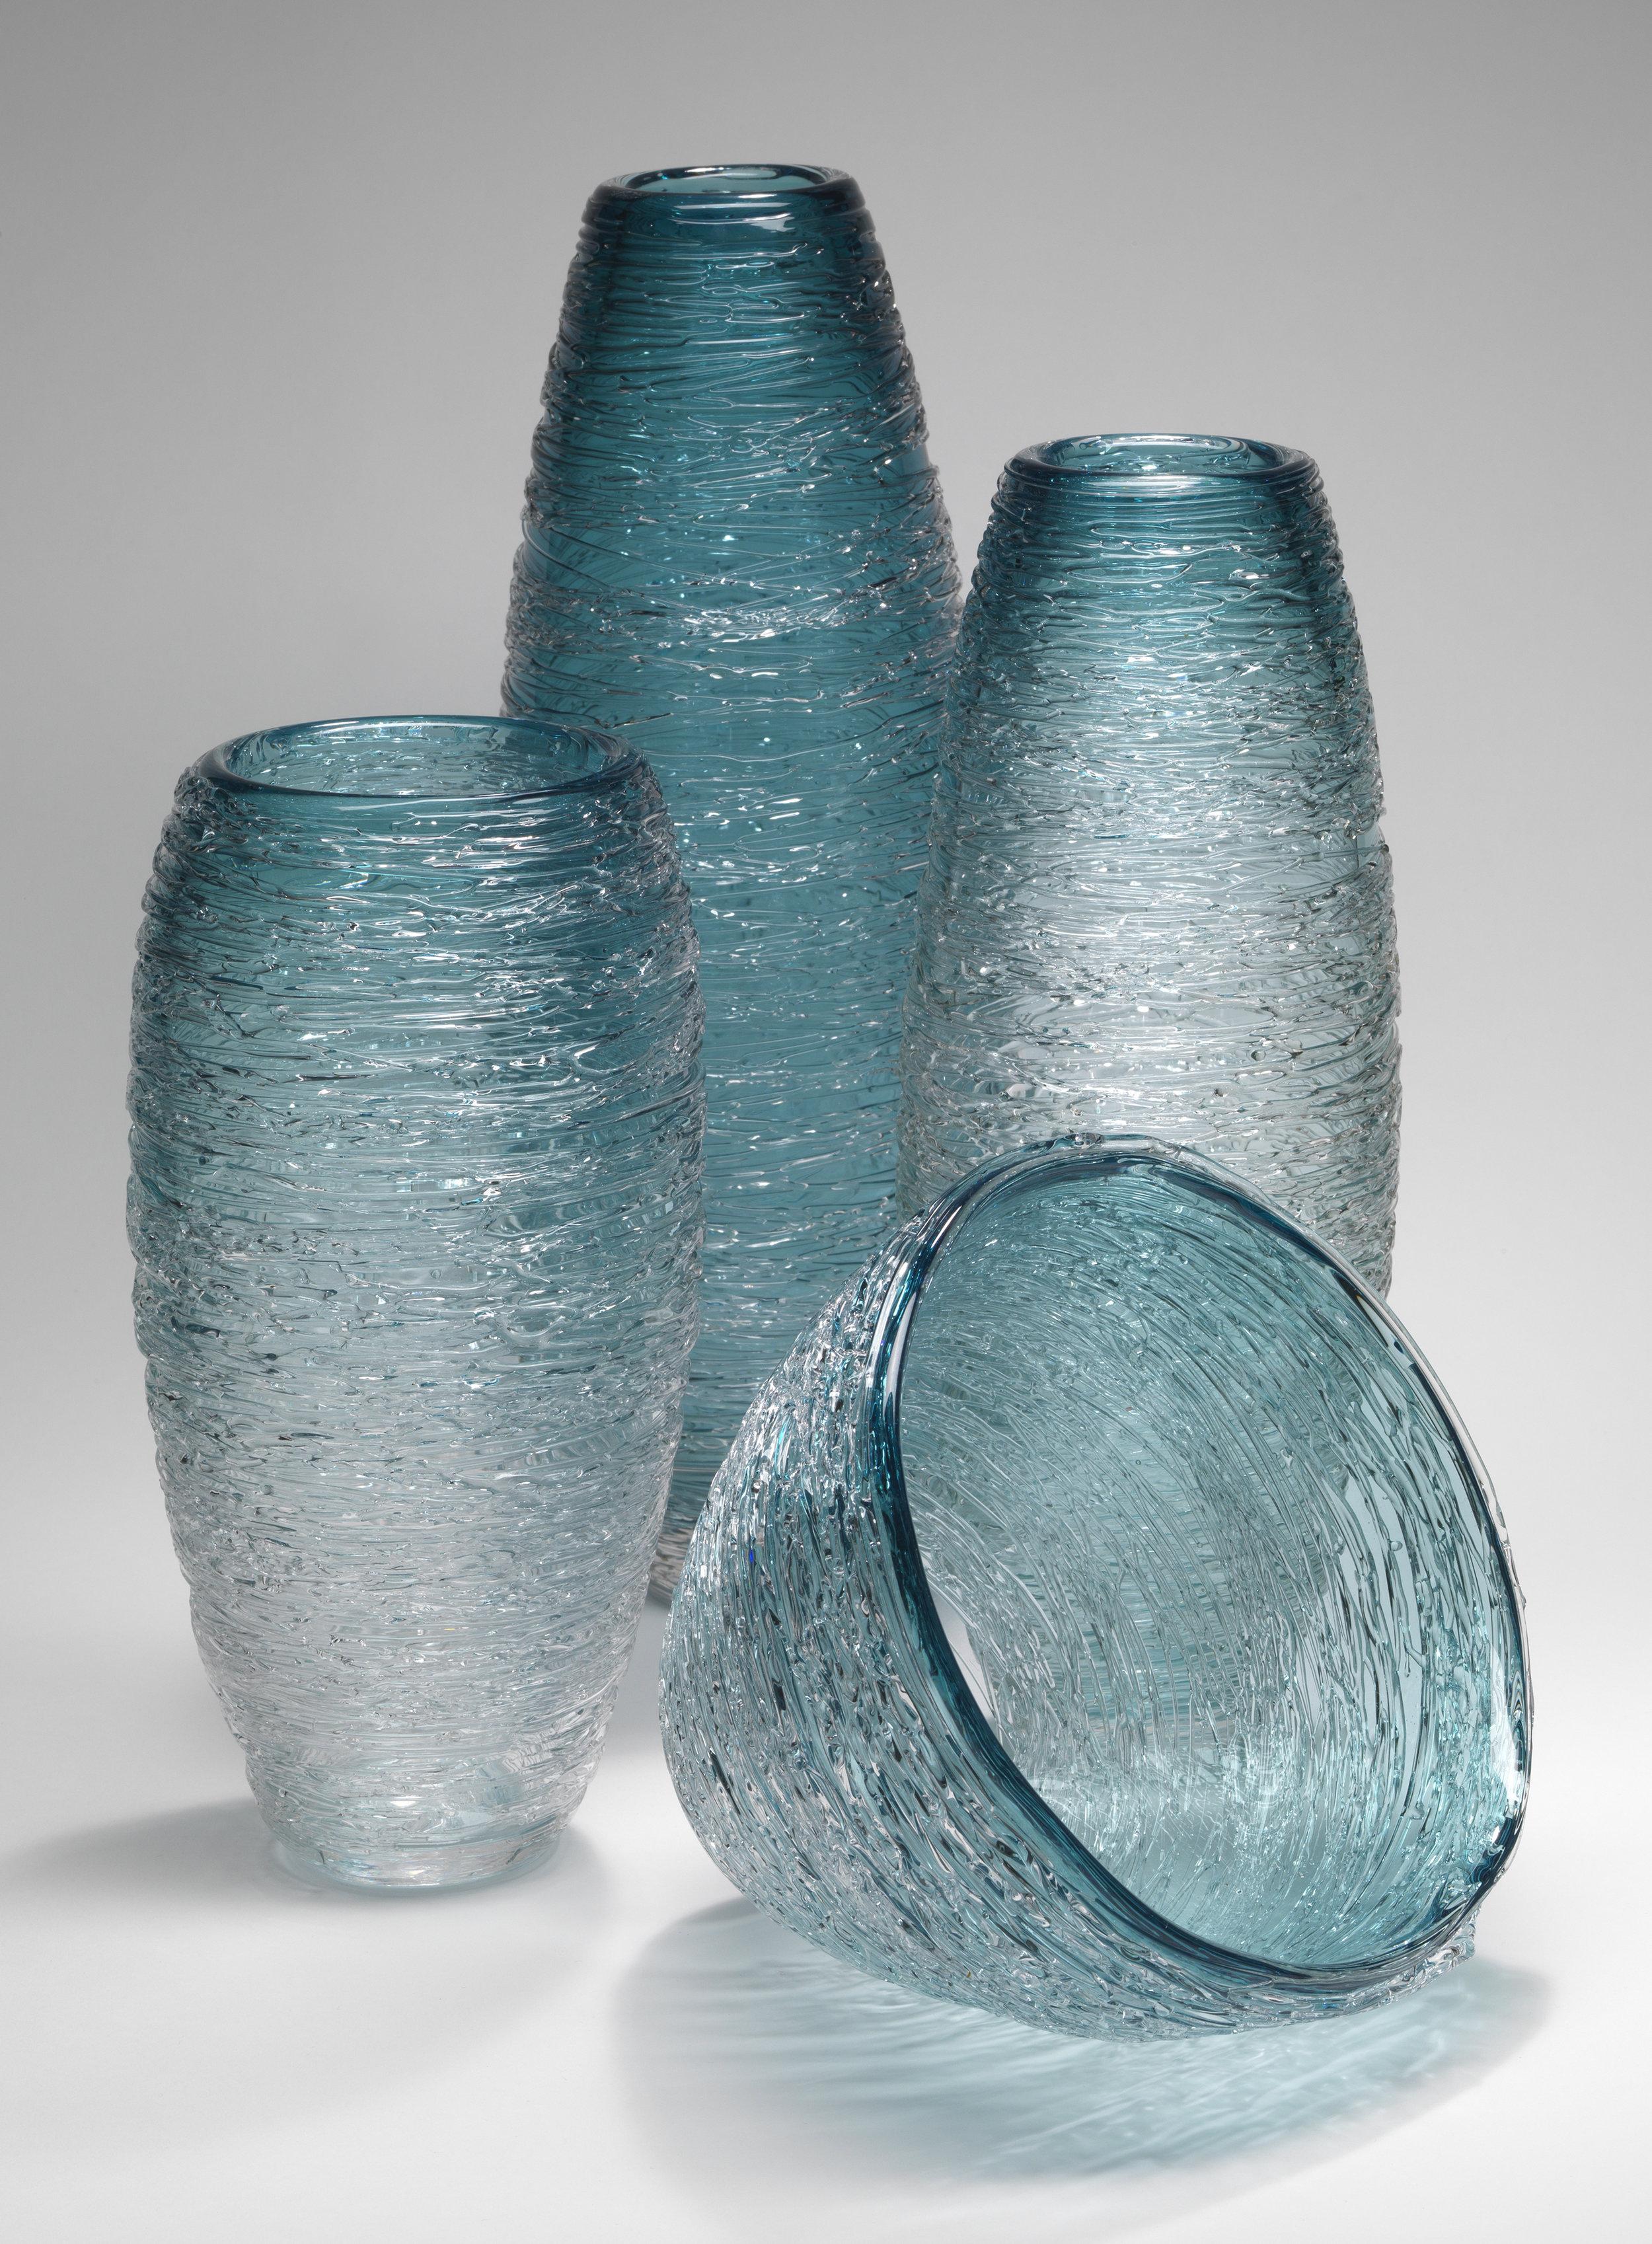 BlueGossamervessels.jpg